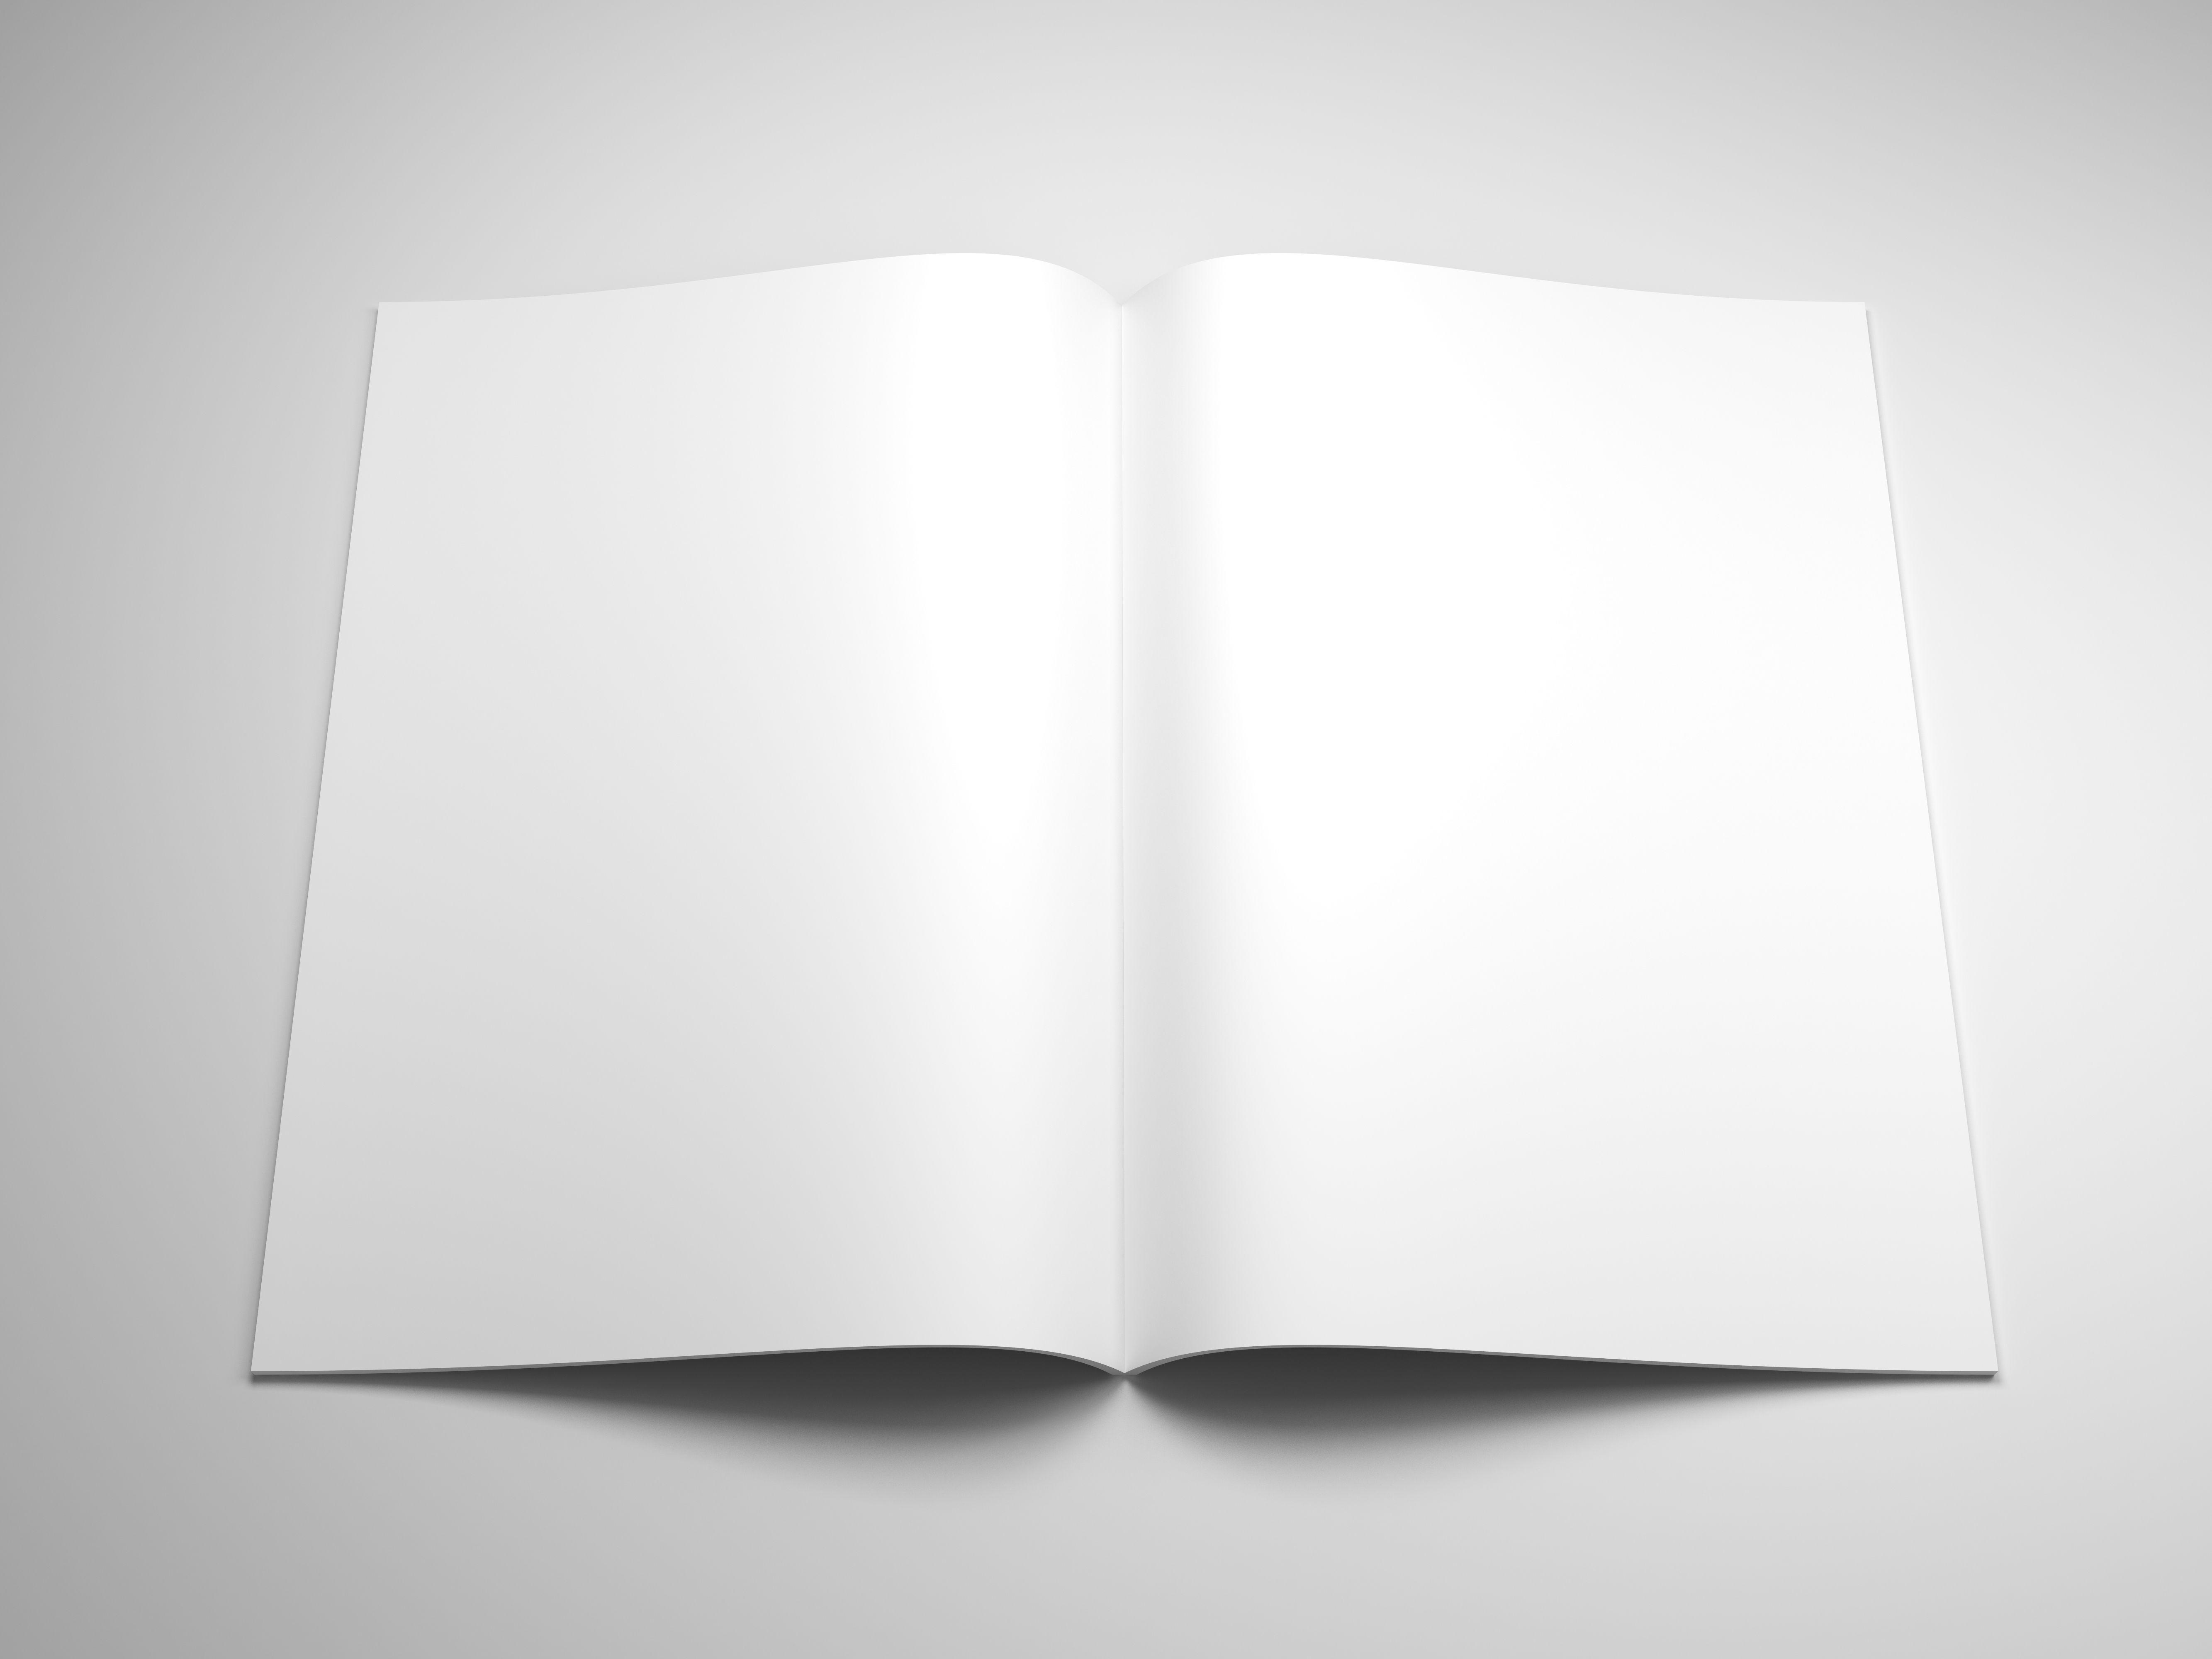 Blank magazine cover psd